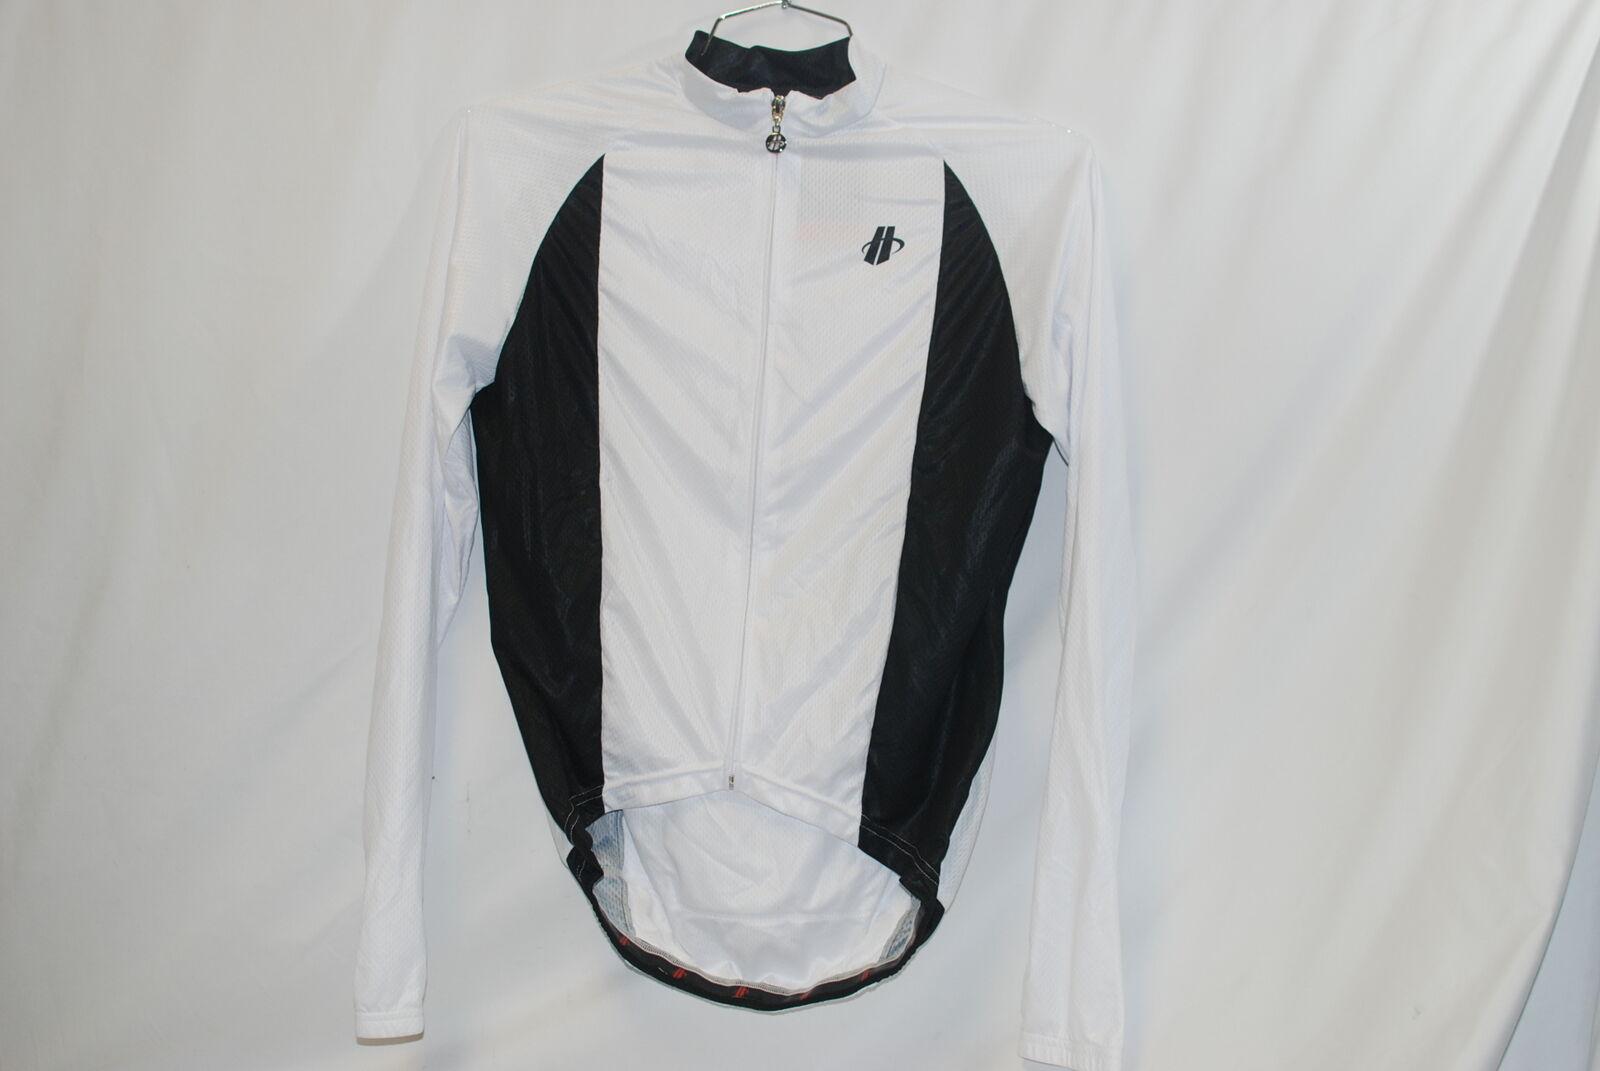 Hincapie Men's Cycling Performer LT LS Jersey Medium Long Sleeve White M NEW